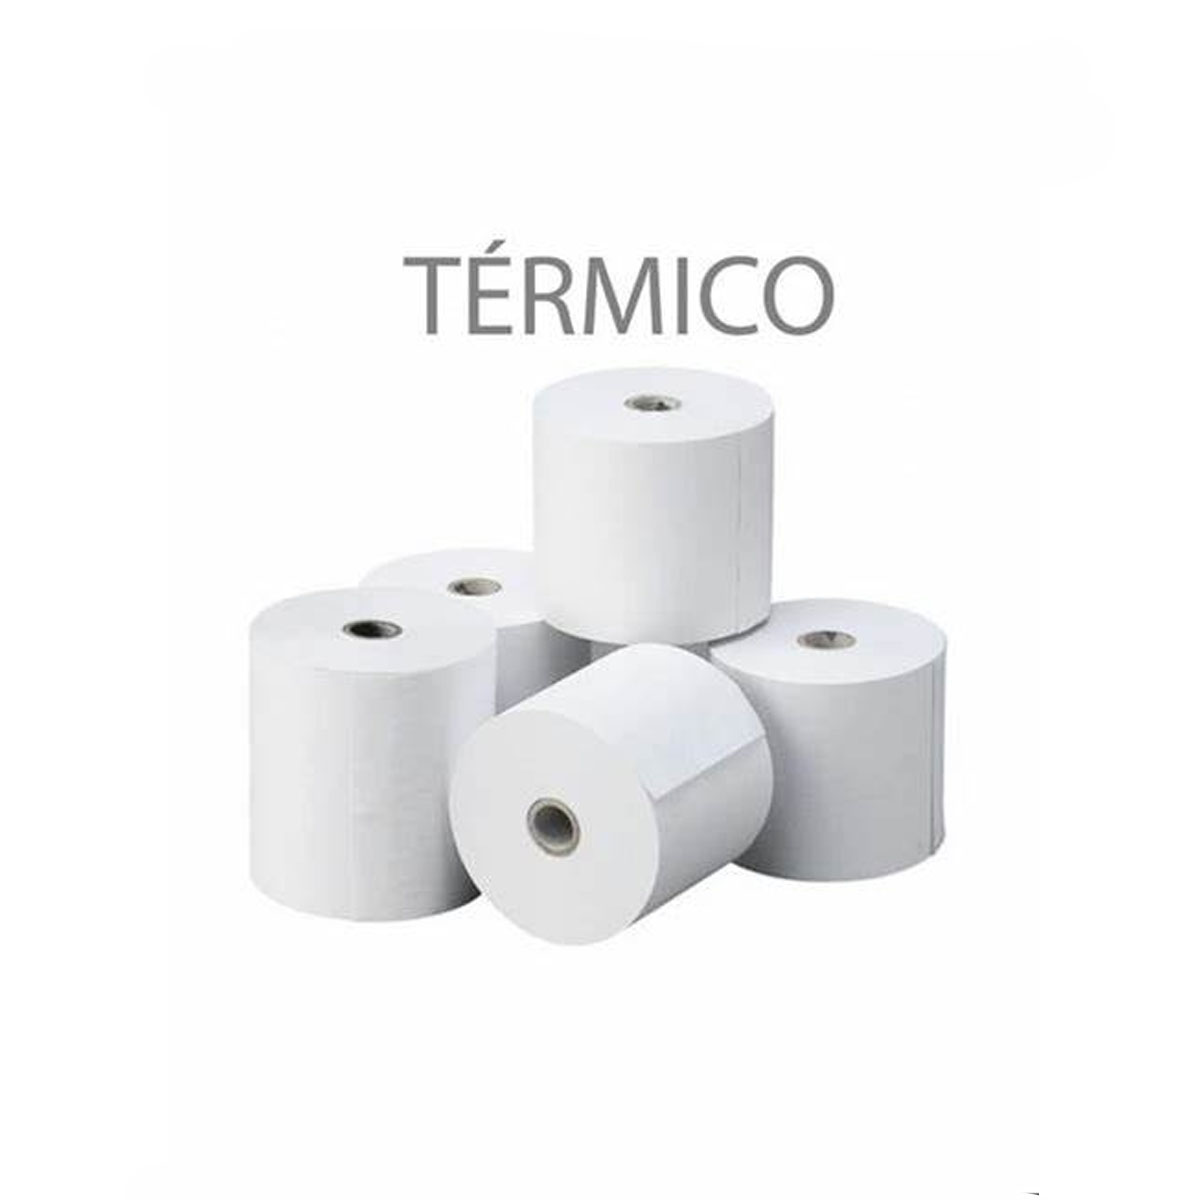 CONTOMETRO PAPEL TERMICO 80X80